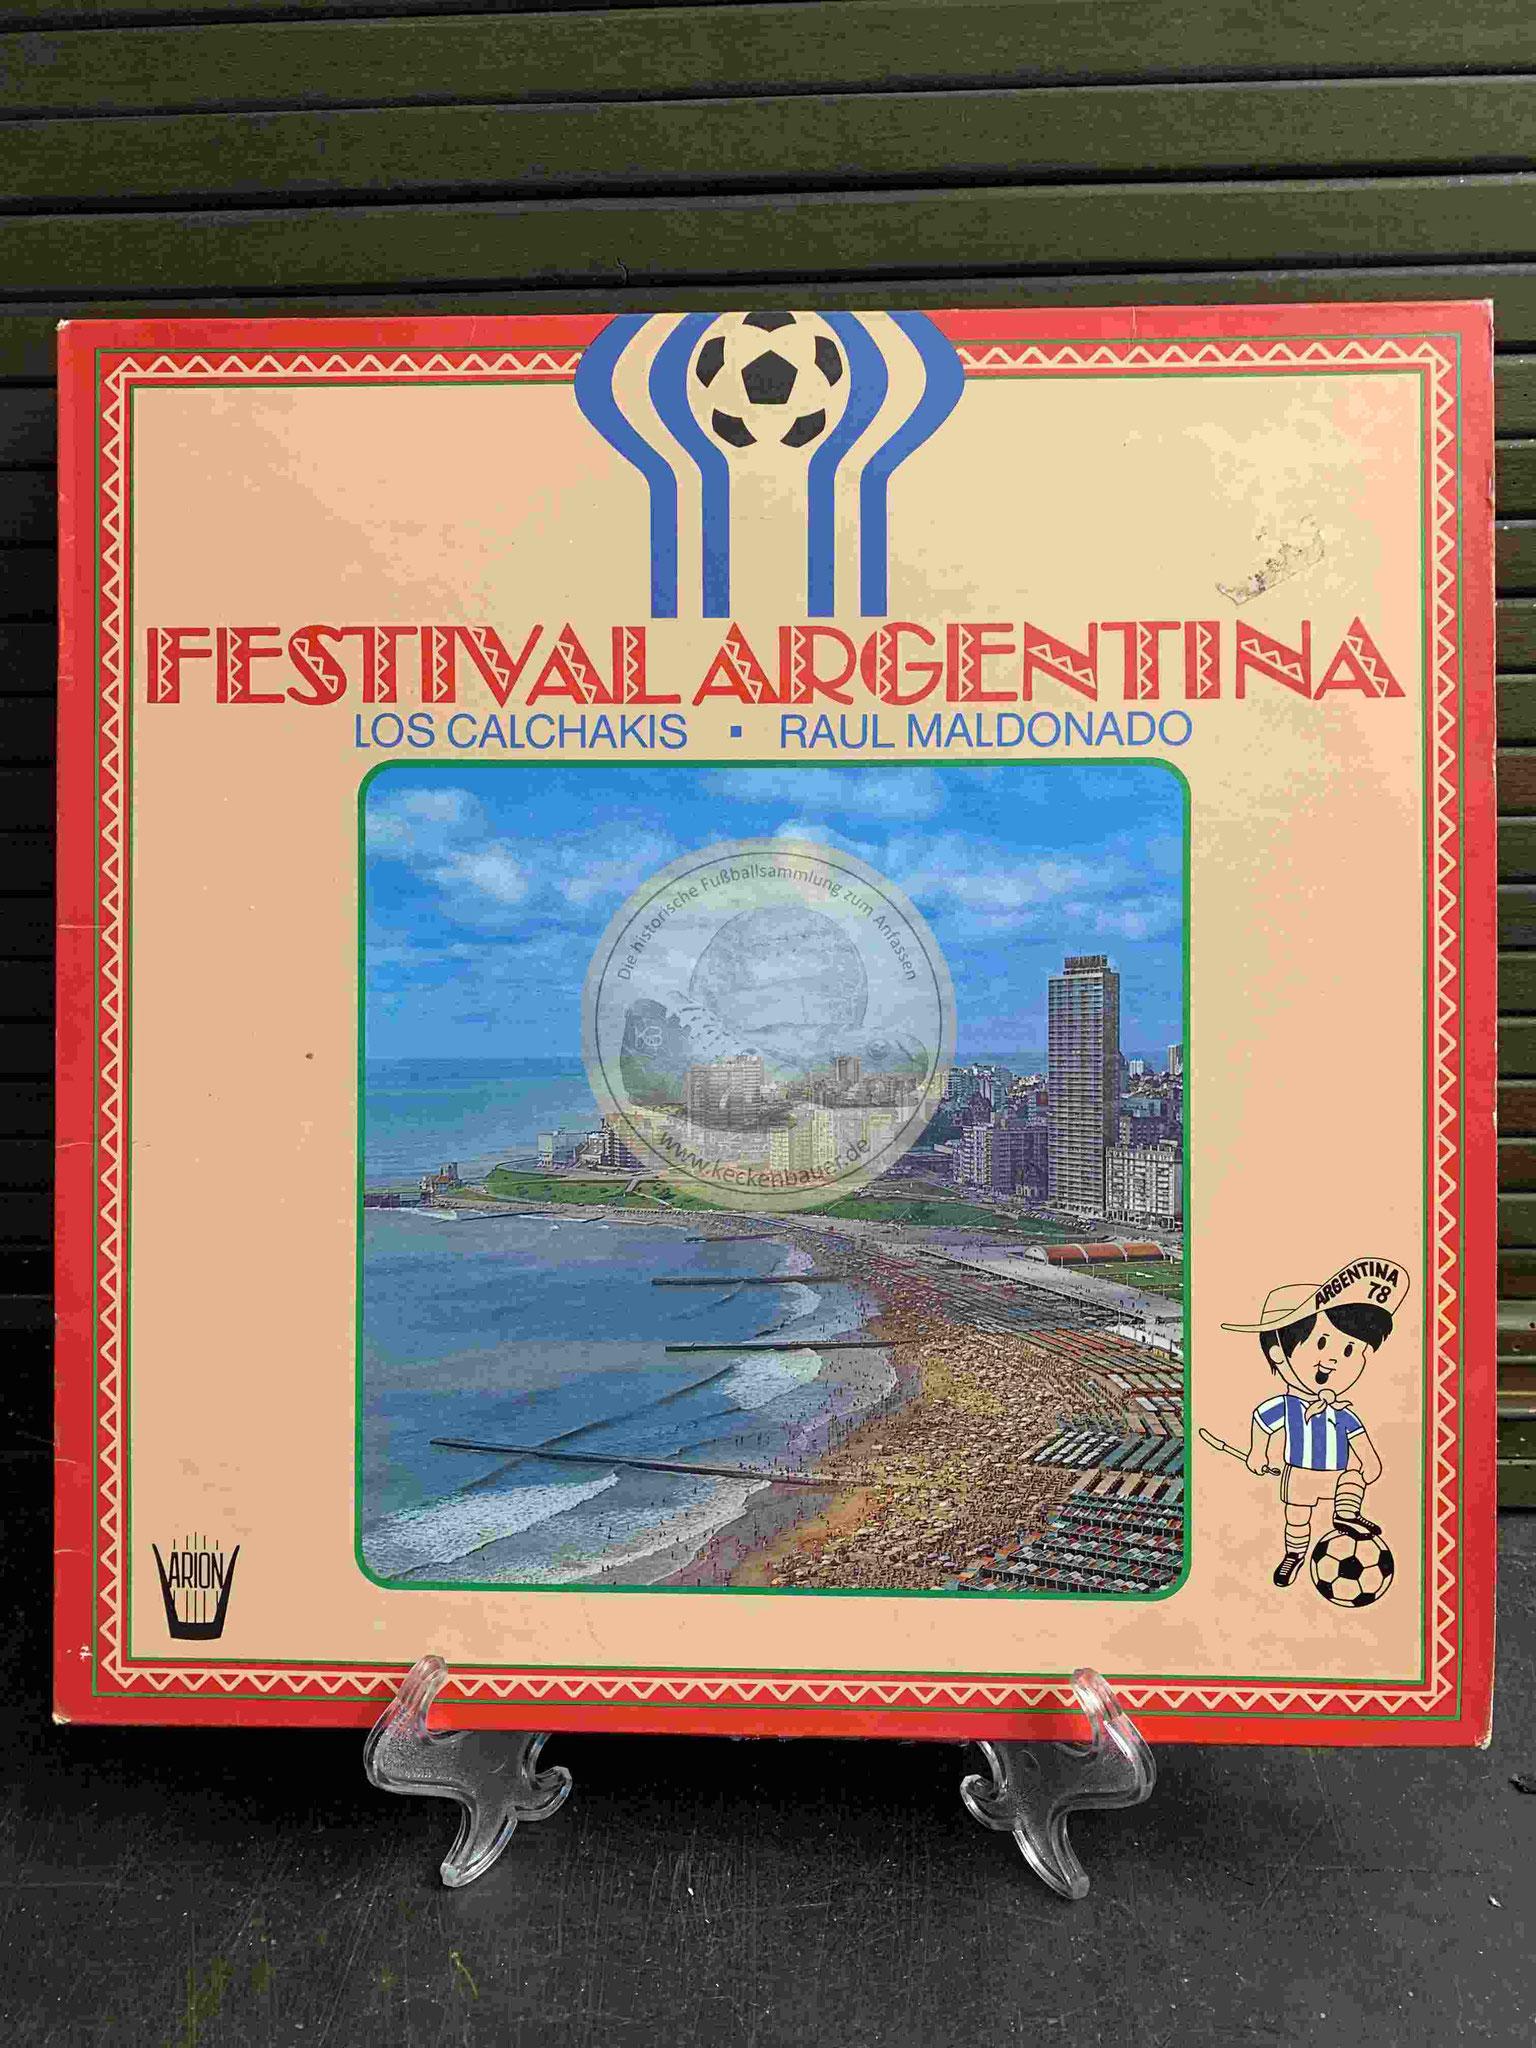 1978 Festival Argentina Los Calchakis Raul Maldonado